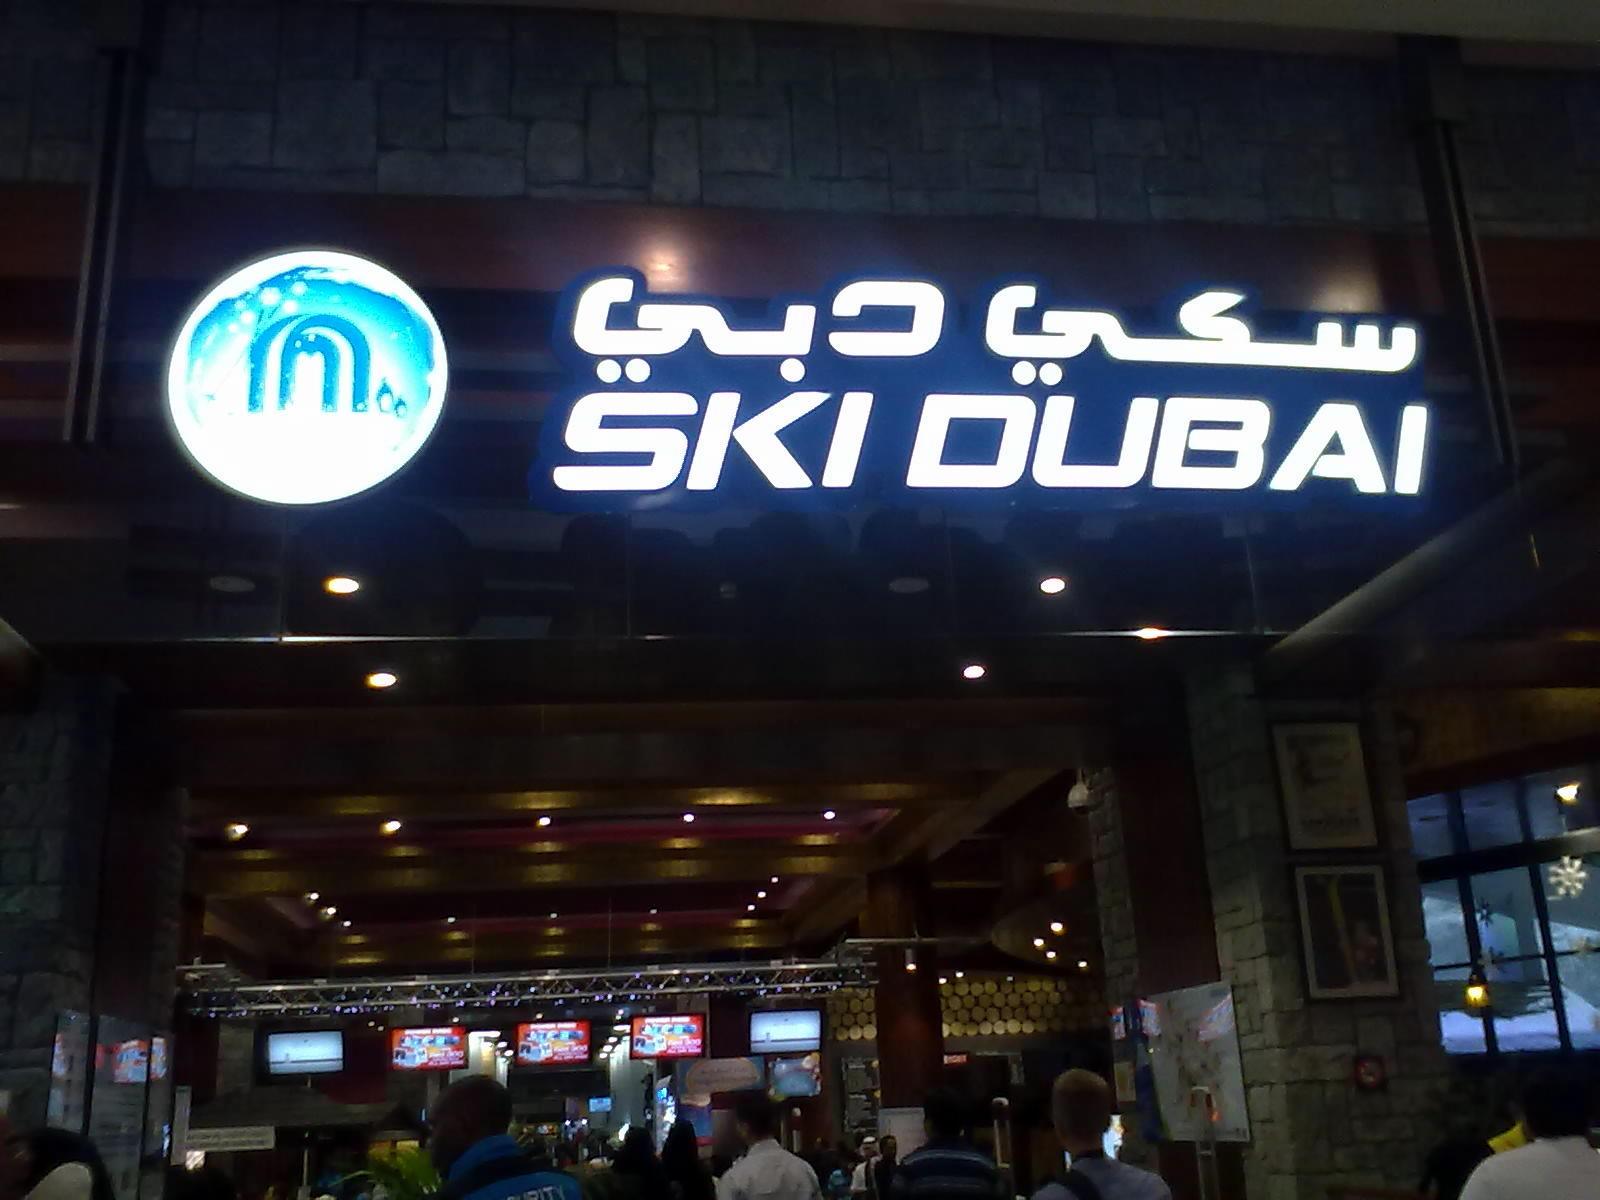 Ski Dubai - sípálya a sivatagban, Mall of Emirates